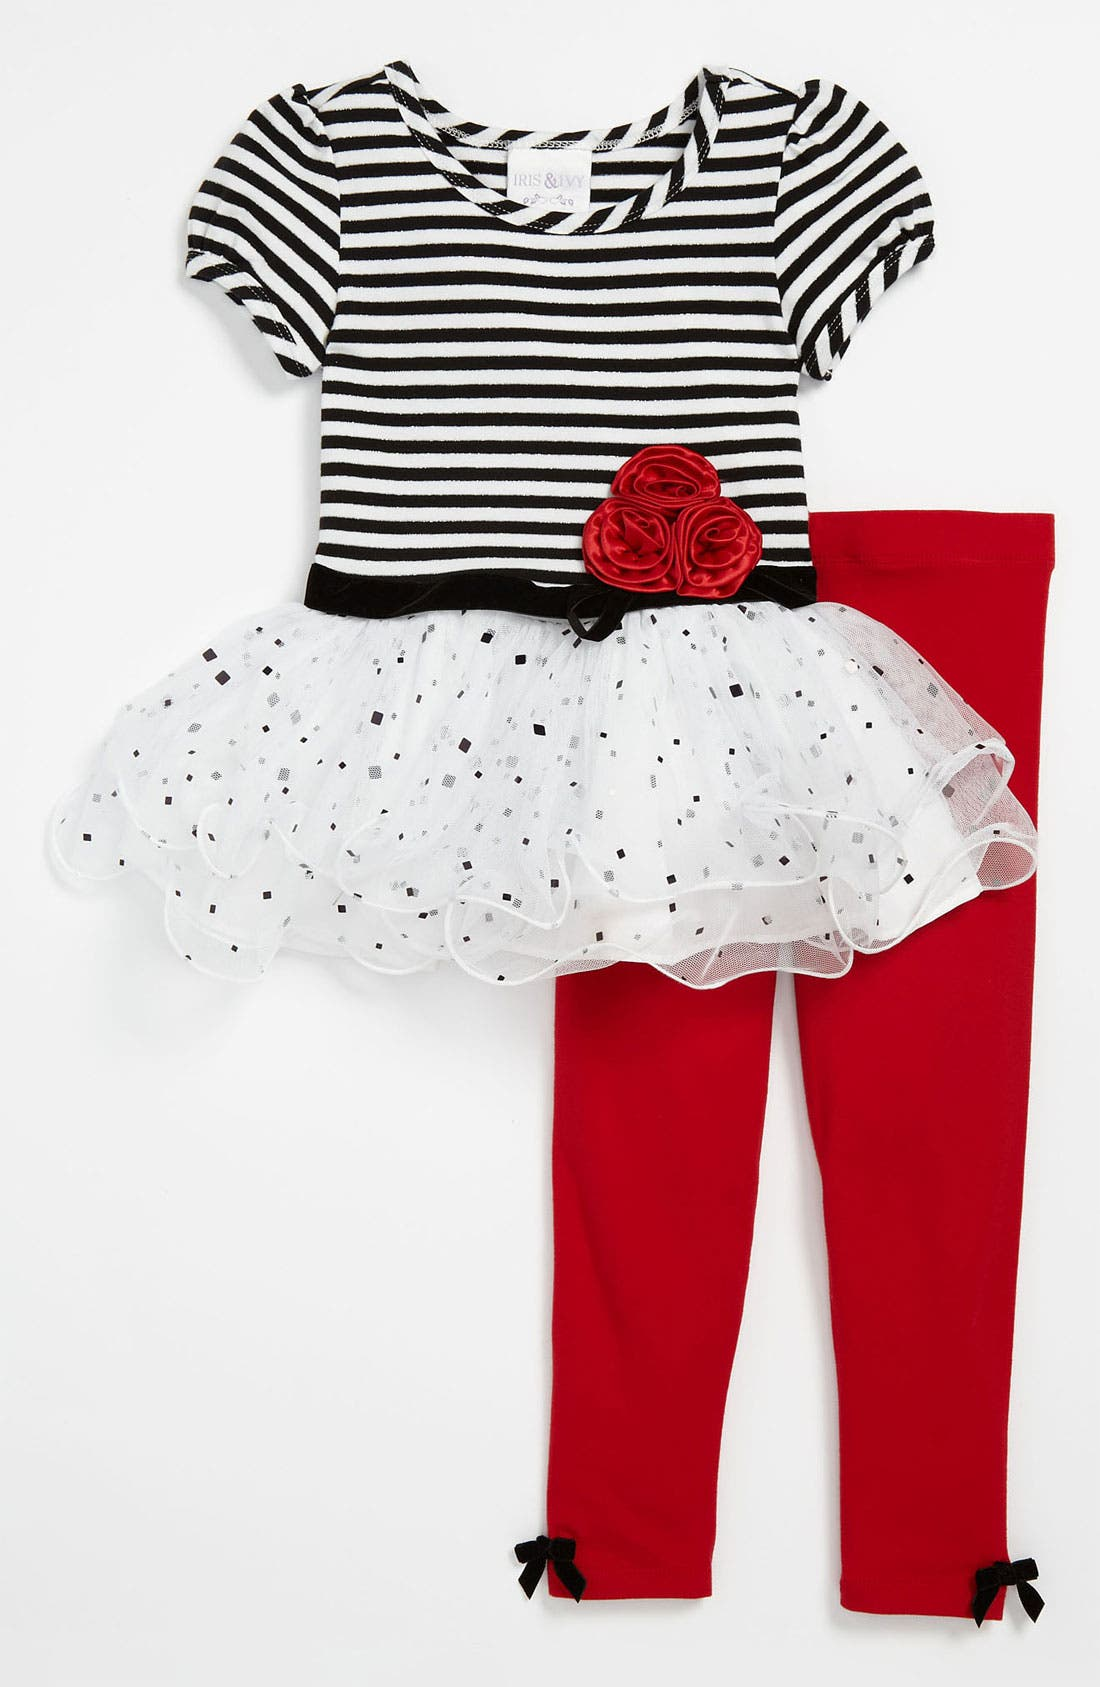 Main Image - Iris & Ivy Stripe Dress & Leggings (Infant)